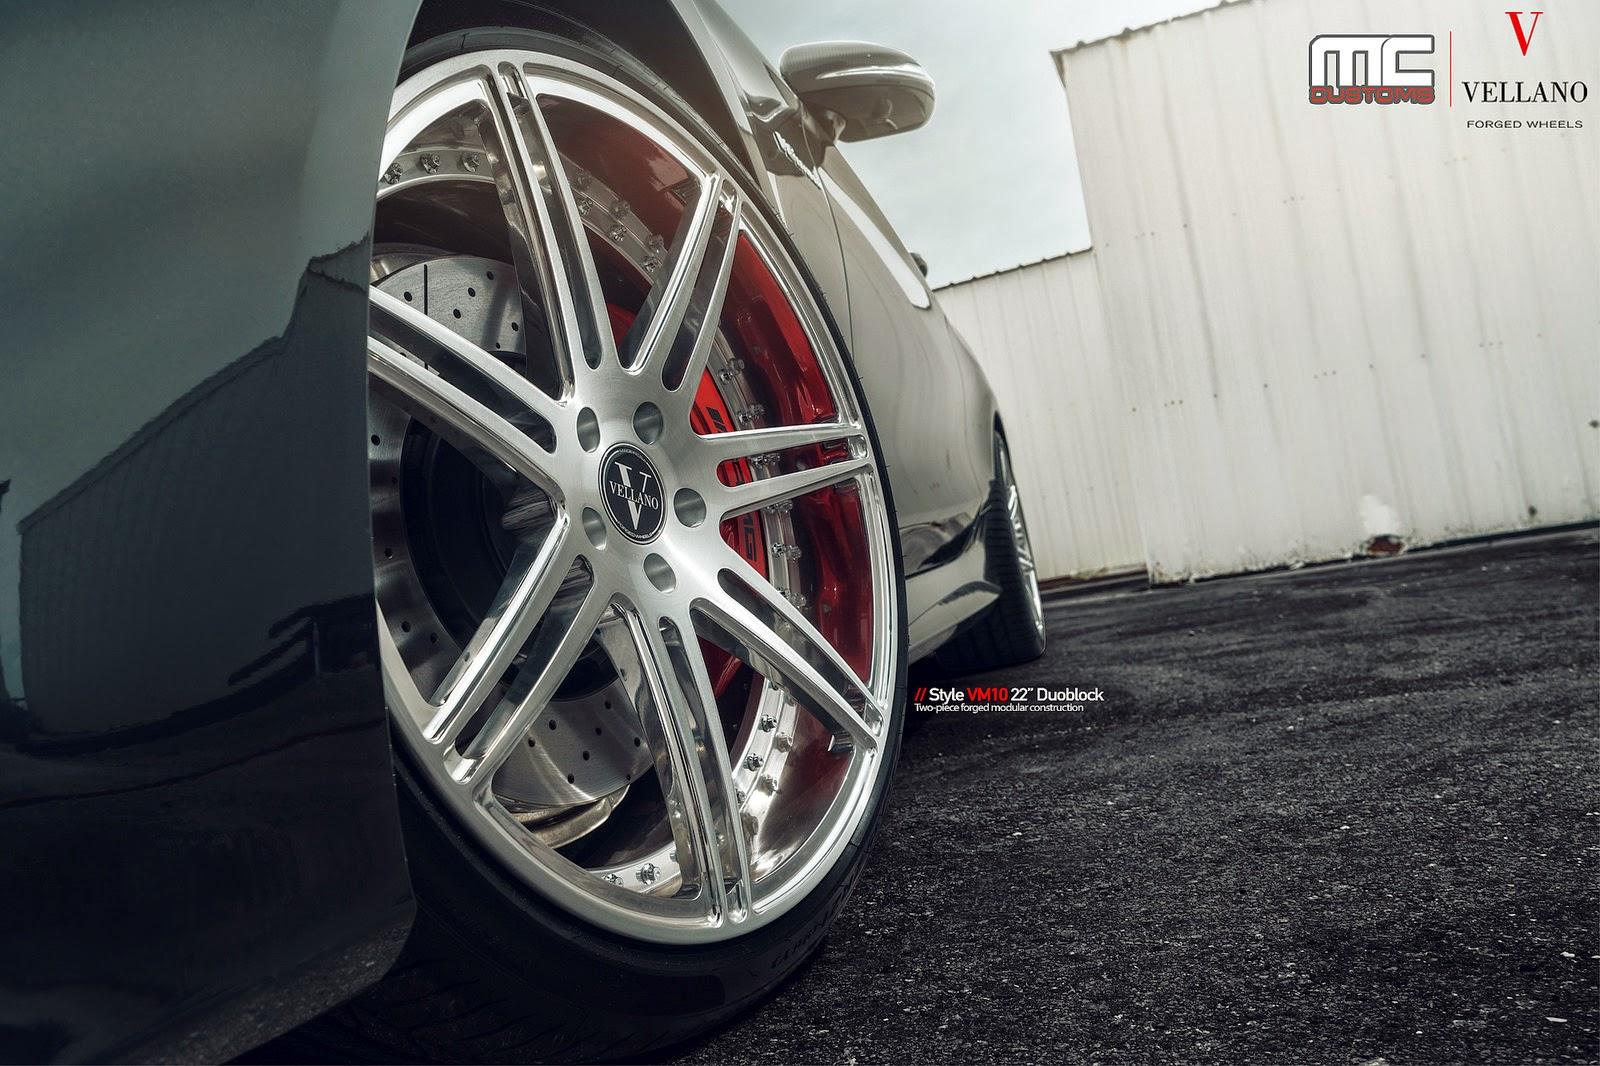 Mercedes-Benz S63 AMG On Vellano VM10 22'' Duoblock By MC Customs